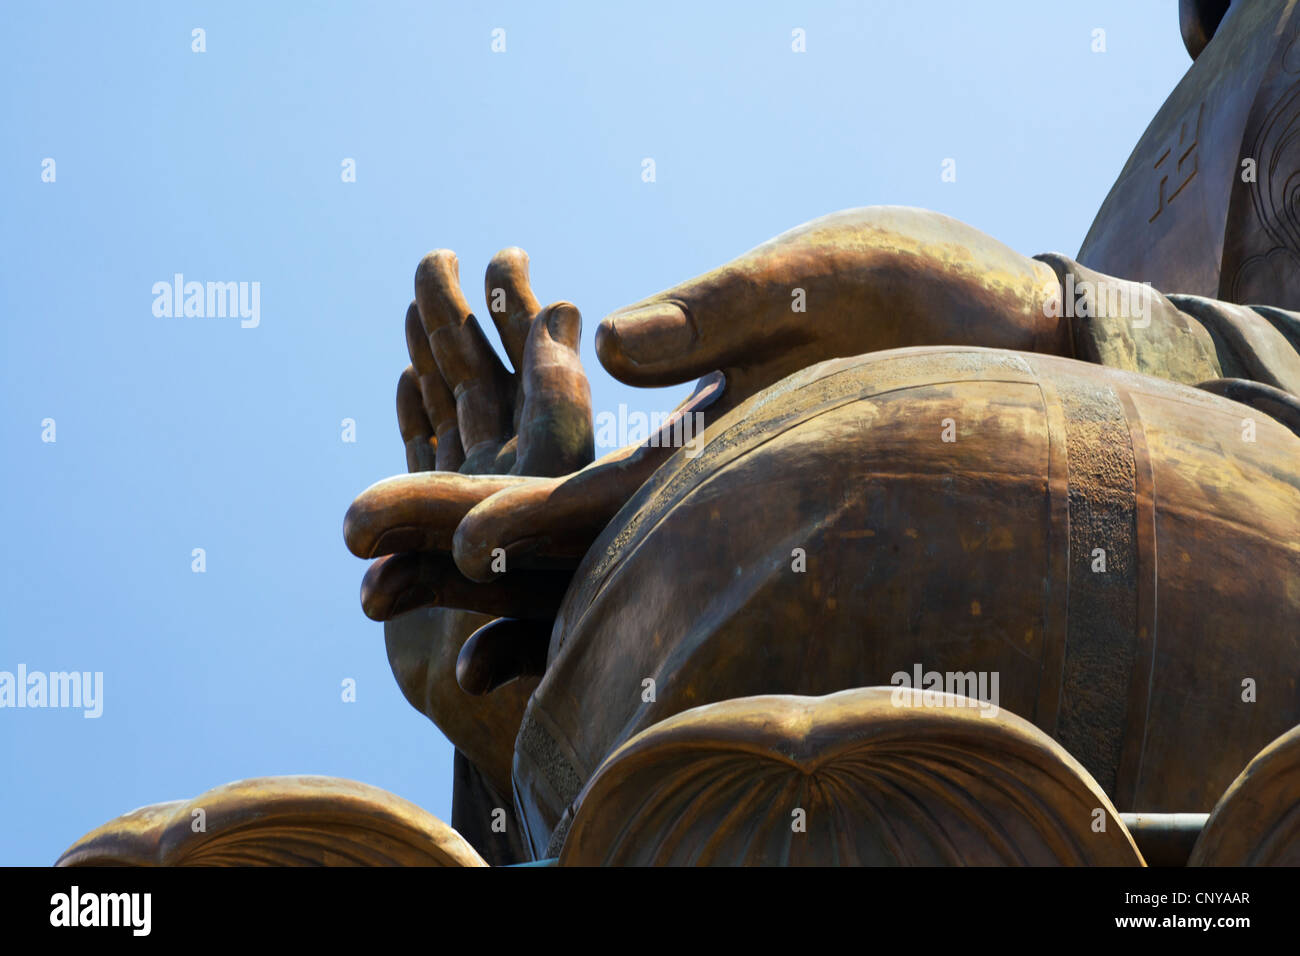 Buddha's hands, the Giant Buddha, Lantau Island, Hong Kong. - Stock Image